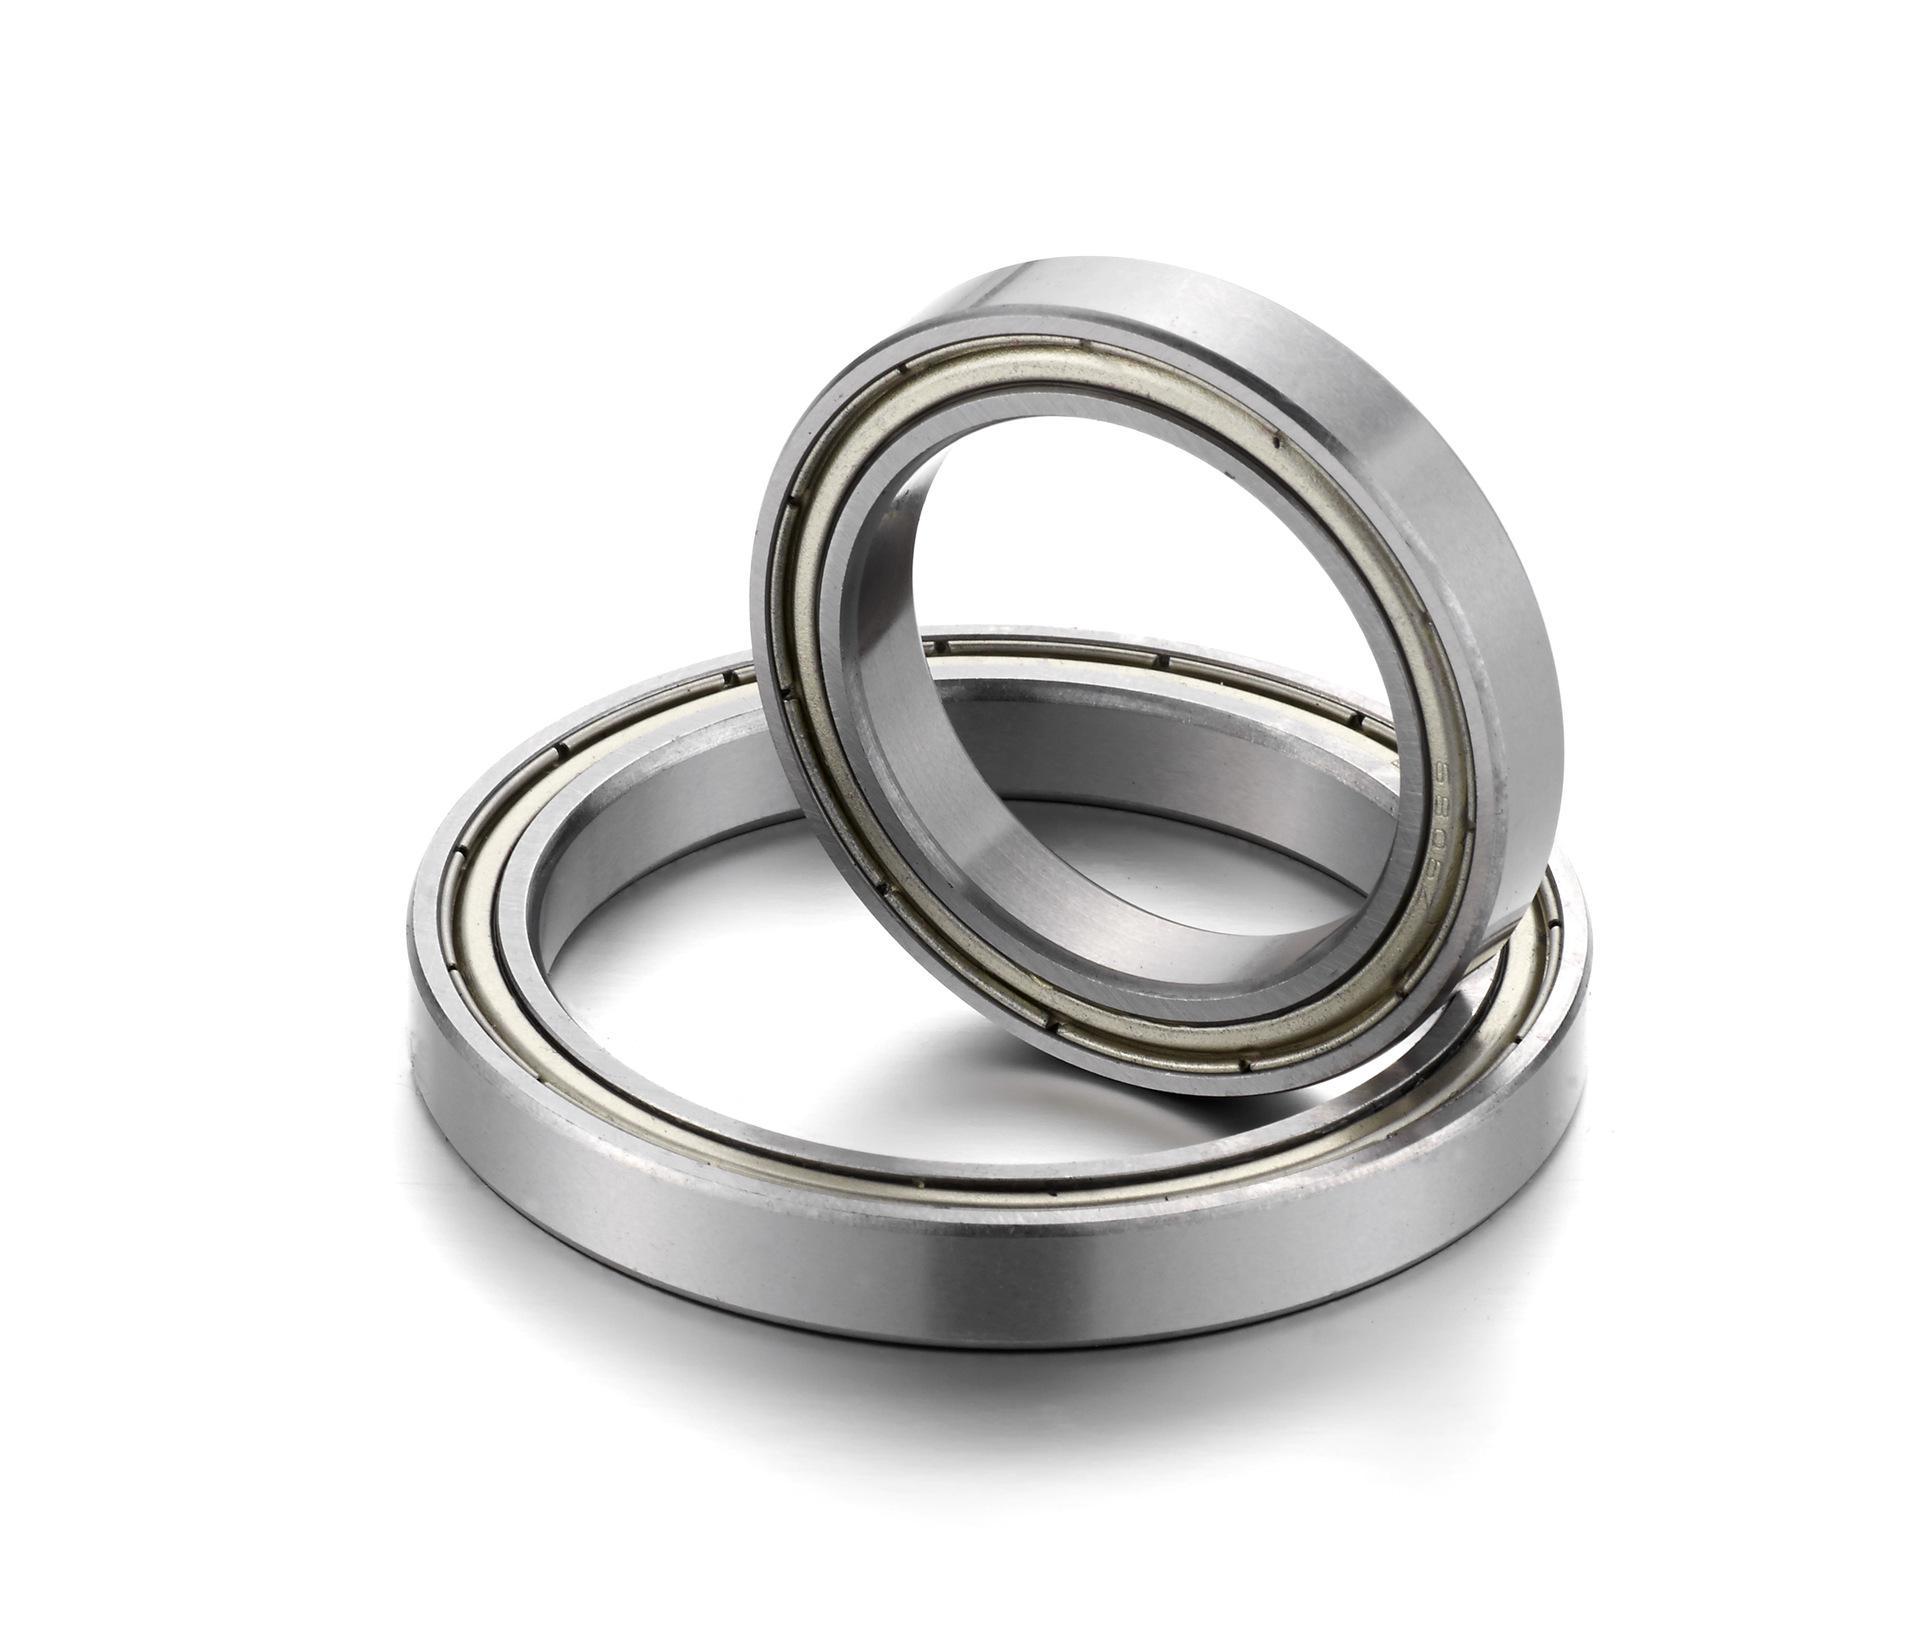 6910 ZZ ABEC-1 (5PCS)  50x72x12MM  Metric Thin Section Bearings 61910Z 6910ZZ 1pcs 71901 71901cd p4 7901 12x24x6 mochu thin walled miniature angular contact bearings speed spindle bearings cnc abec 7